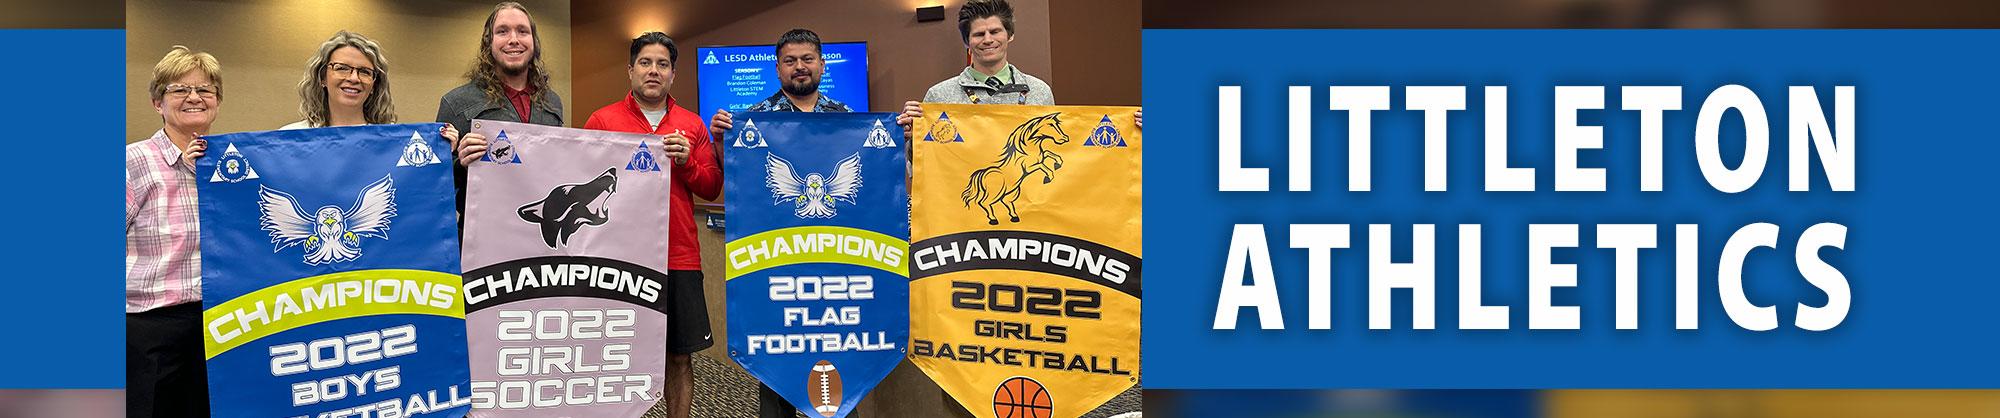 Littleton Athletics - new seasons coming soon!